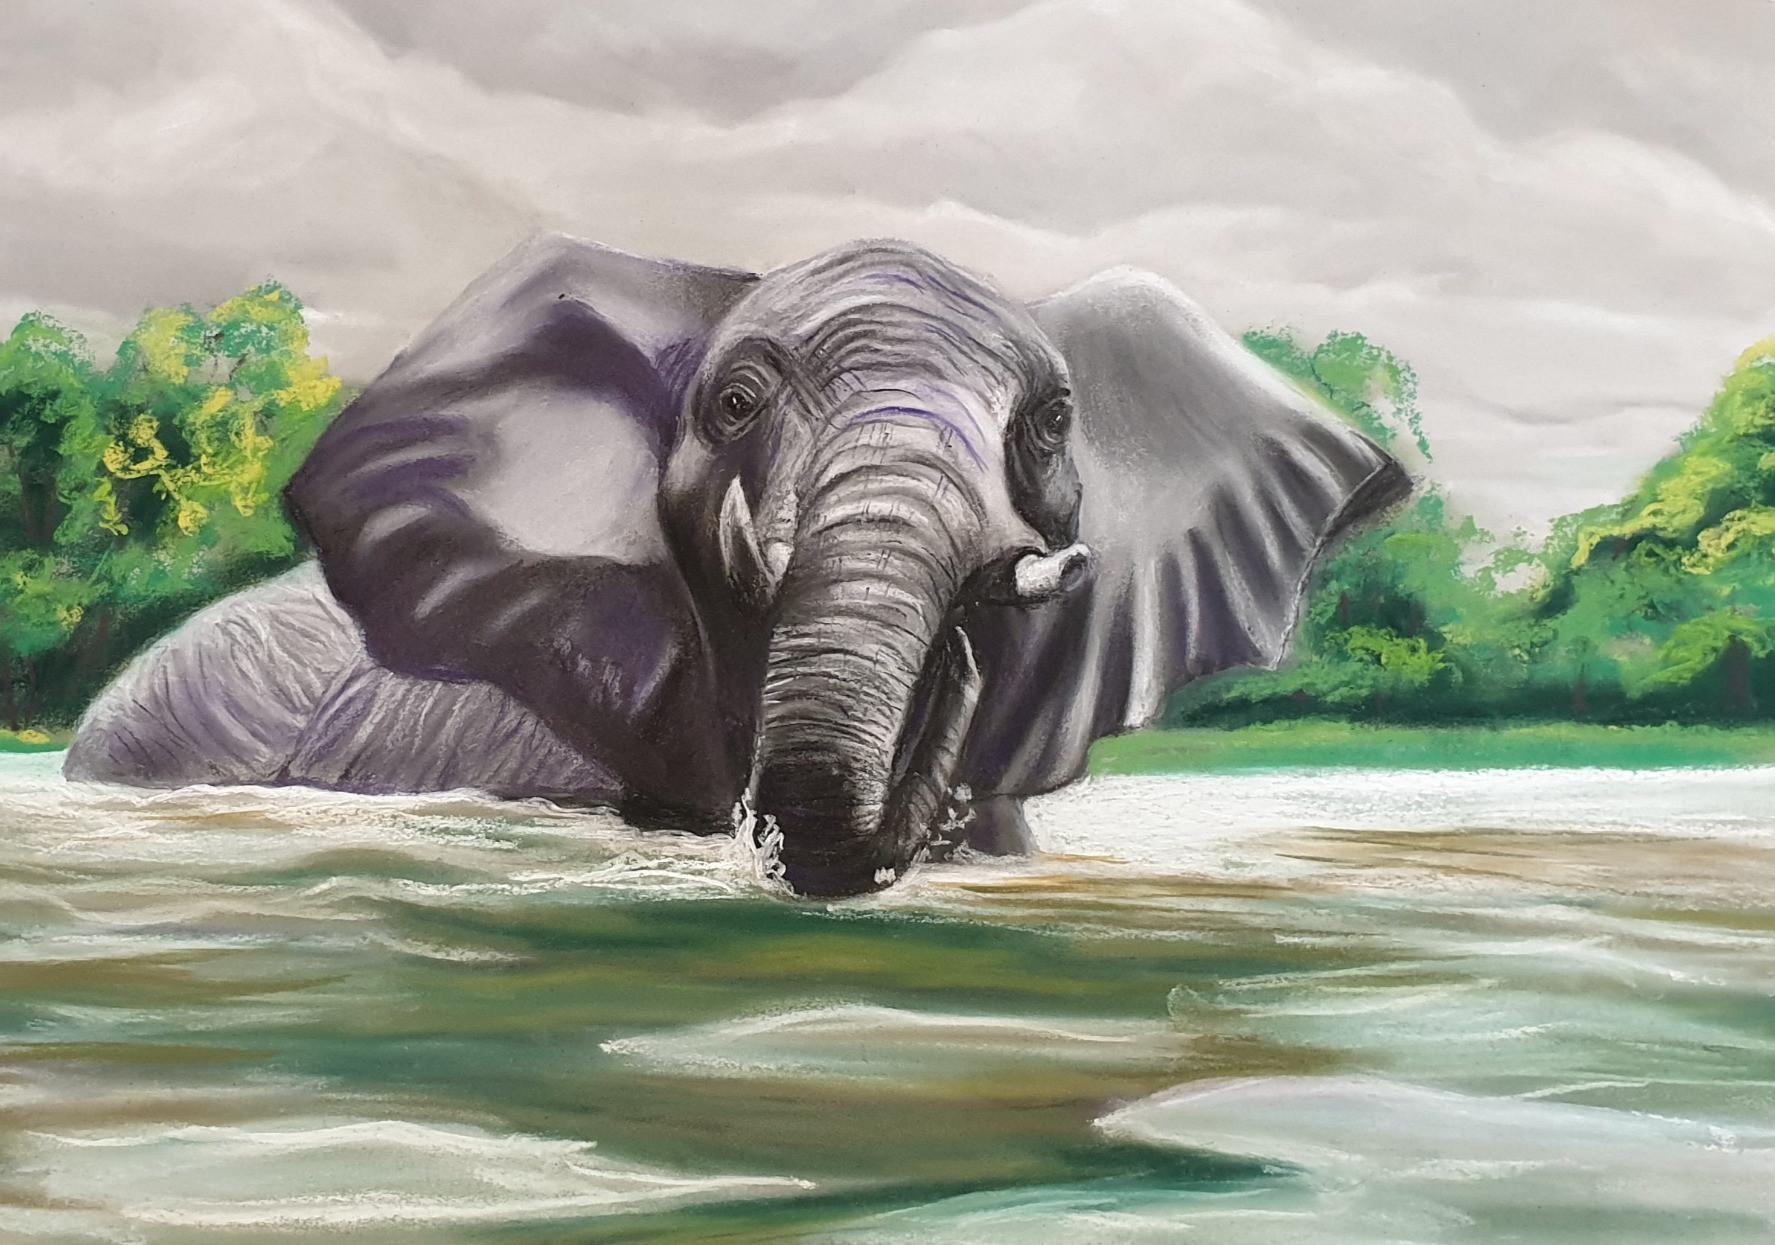 Elephant%201_edited.jpg